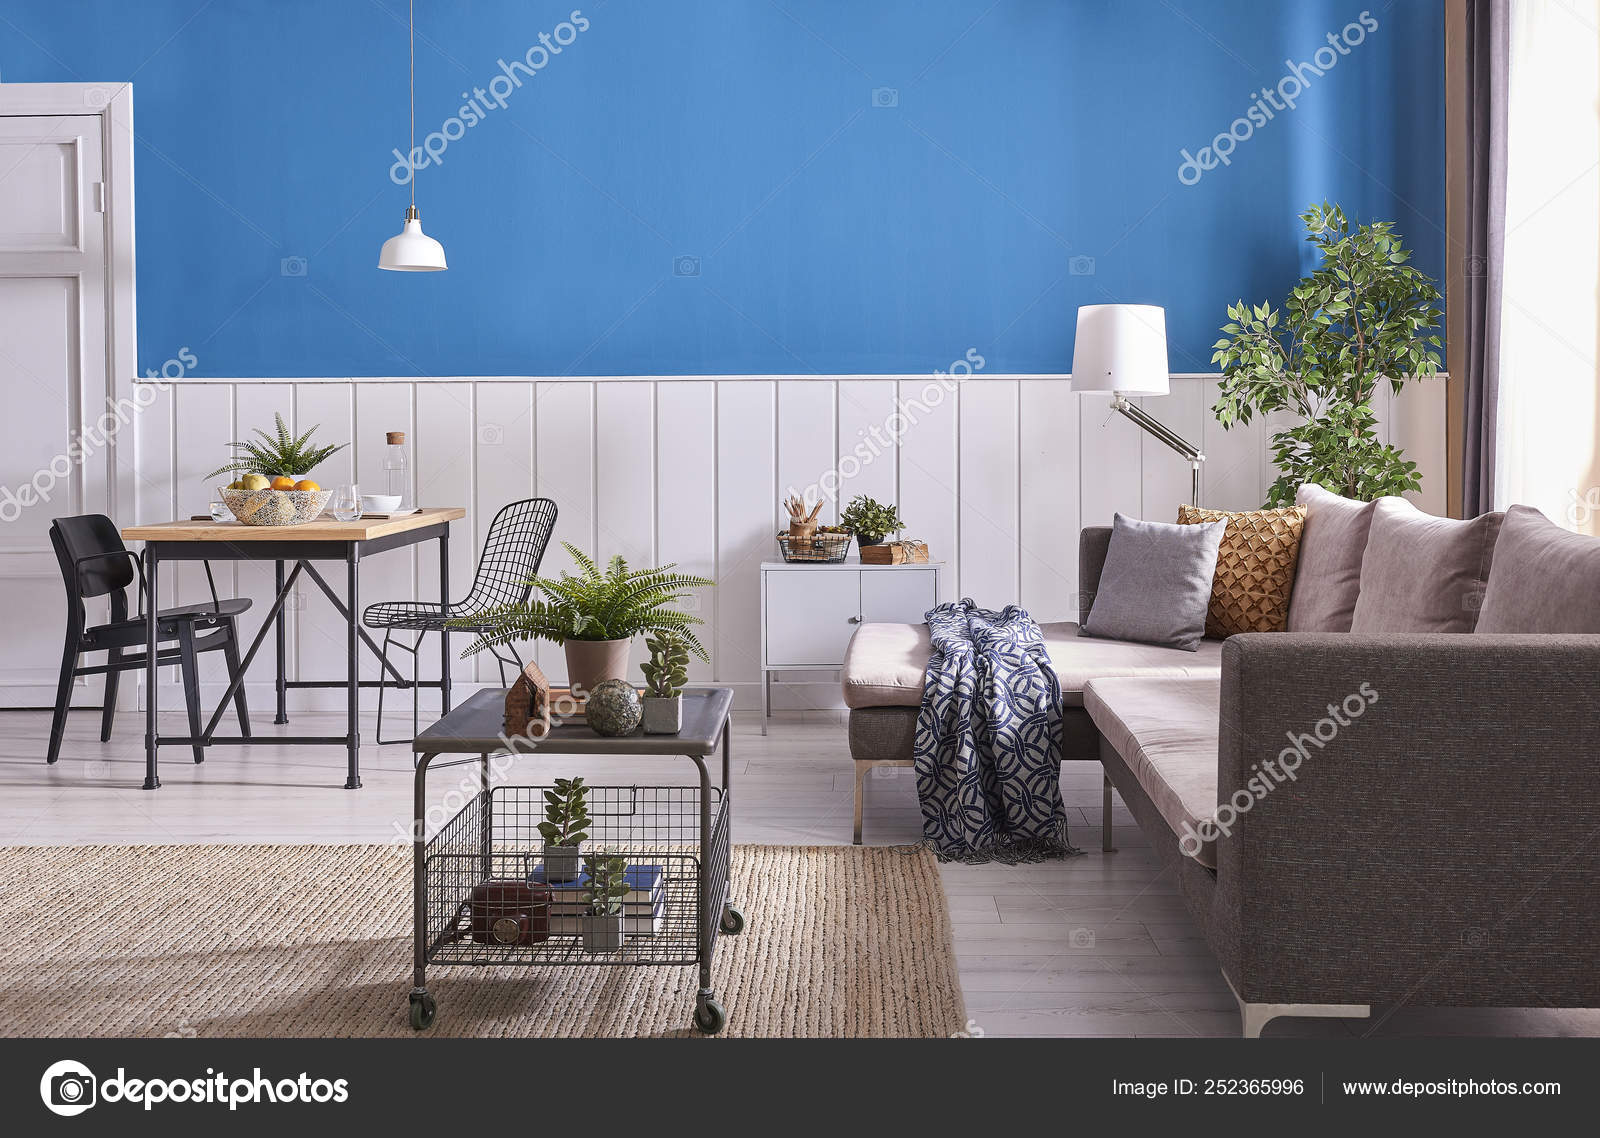 Modern Dining Room Decoration Wooden Table Black Chair Blue White Stock Photo C Unitedphotostudio 252365996